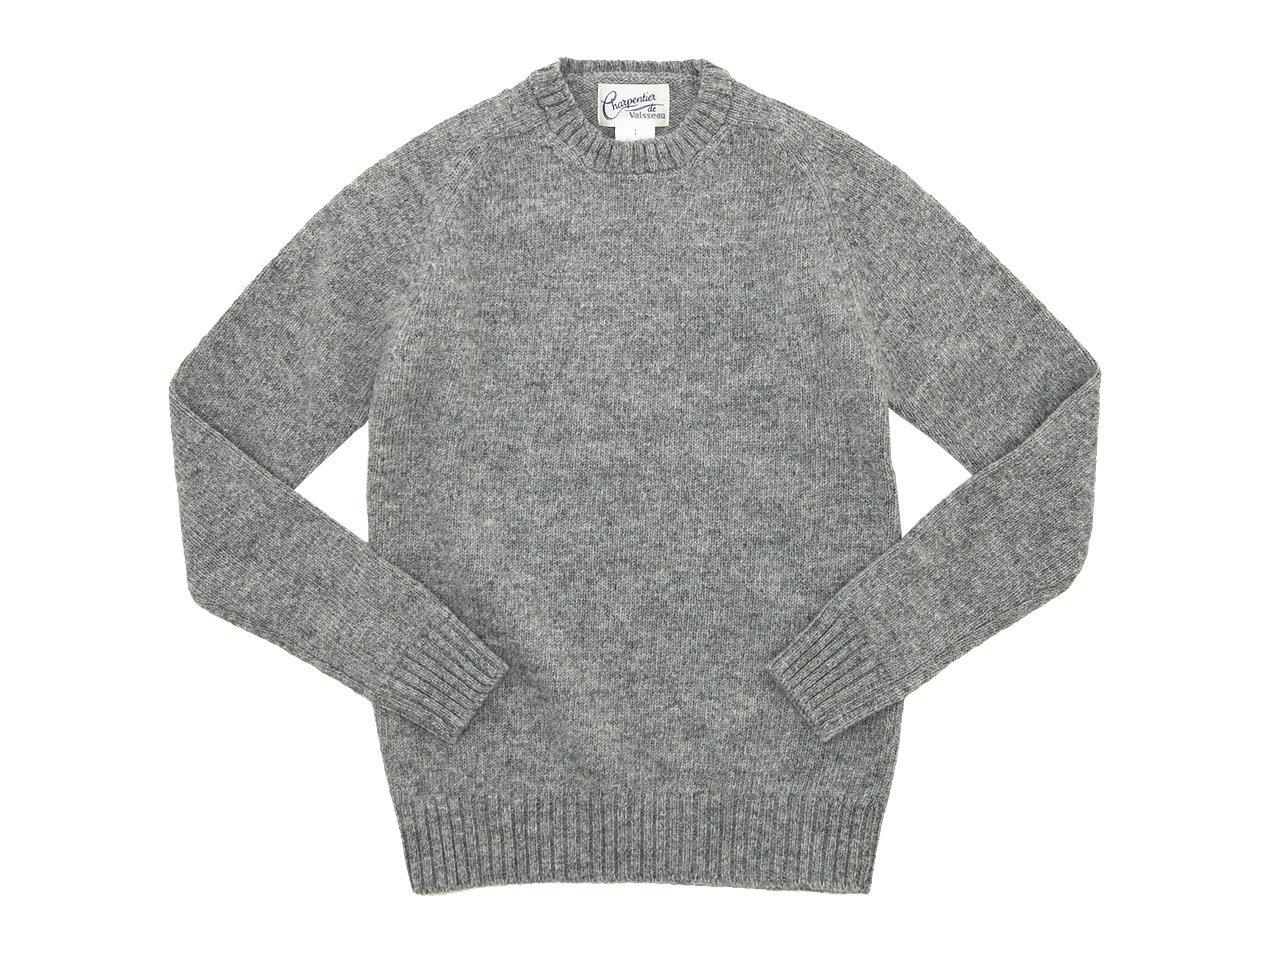 Charpentier de Vaisseau Karl Shetland Crew Neck Knit GRAY